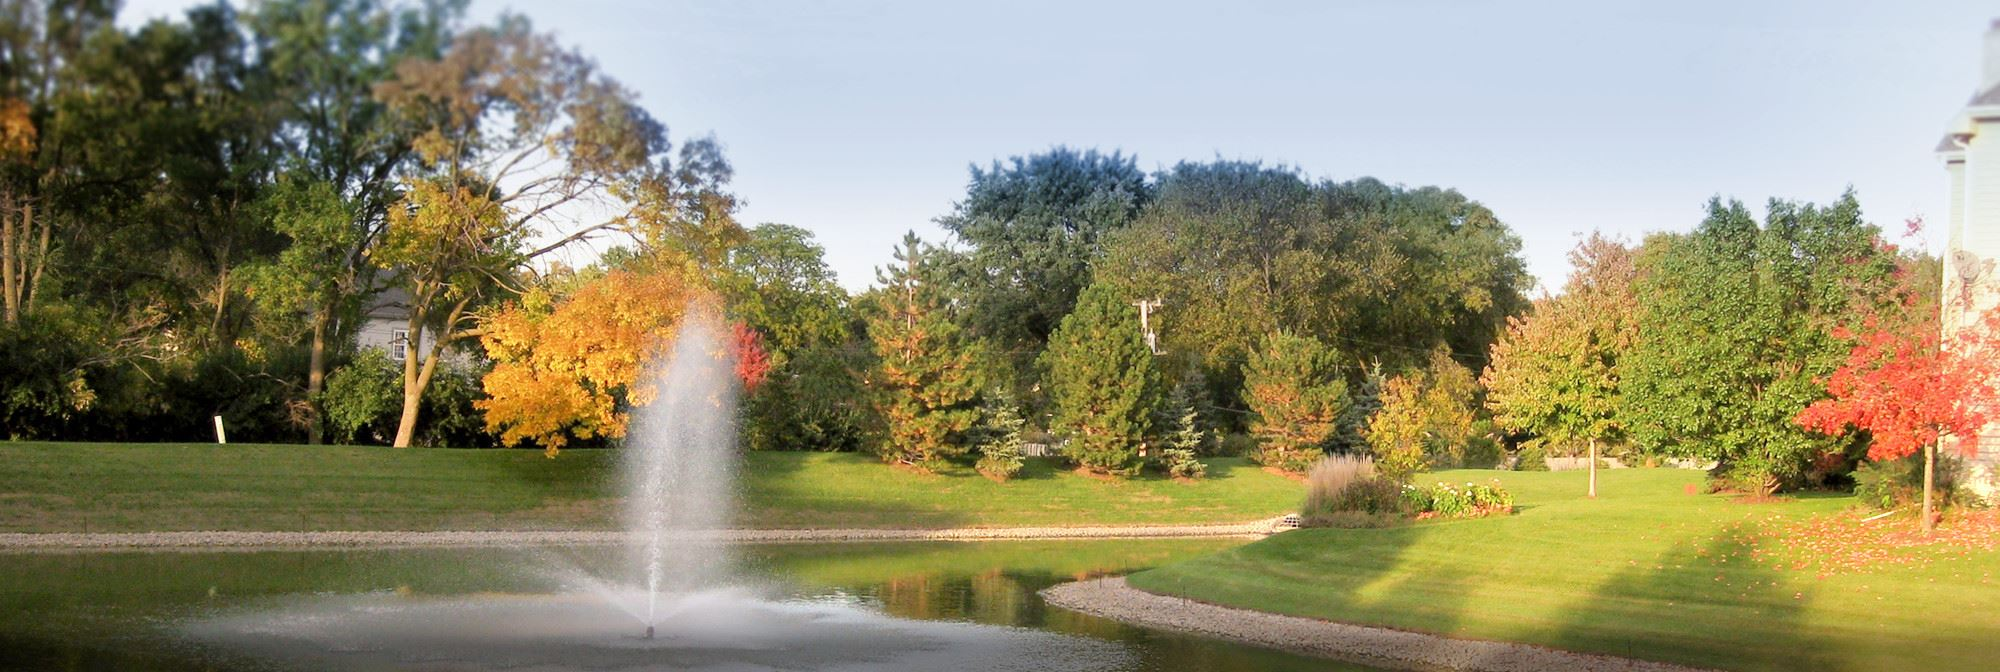 Indian Head Park, IL | Official Website